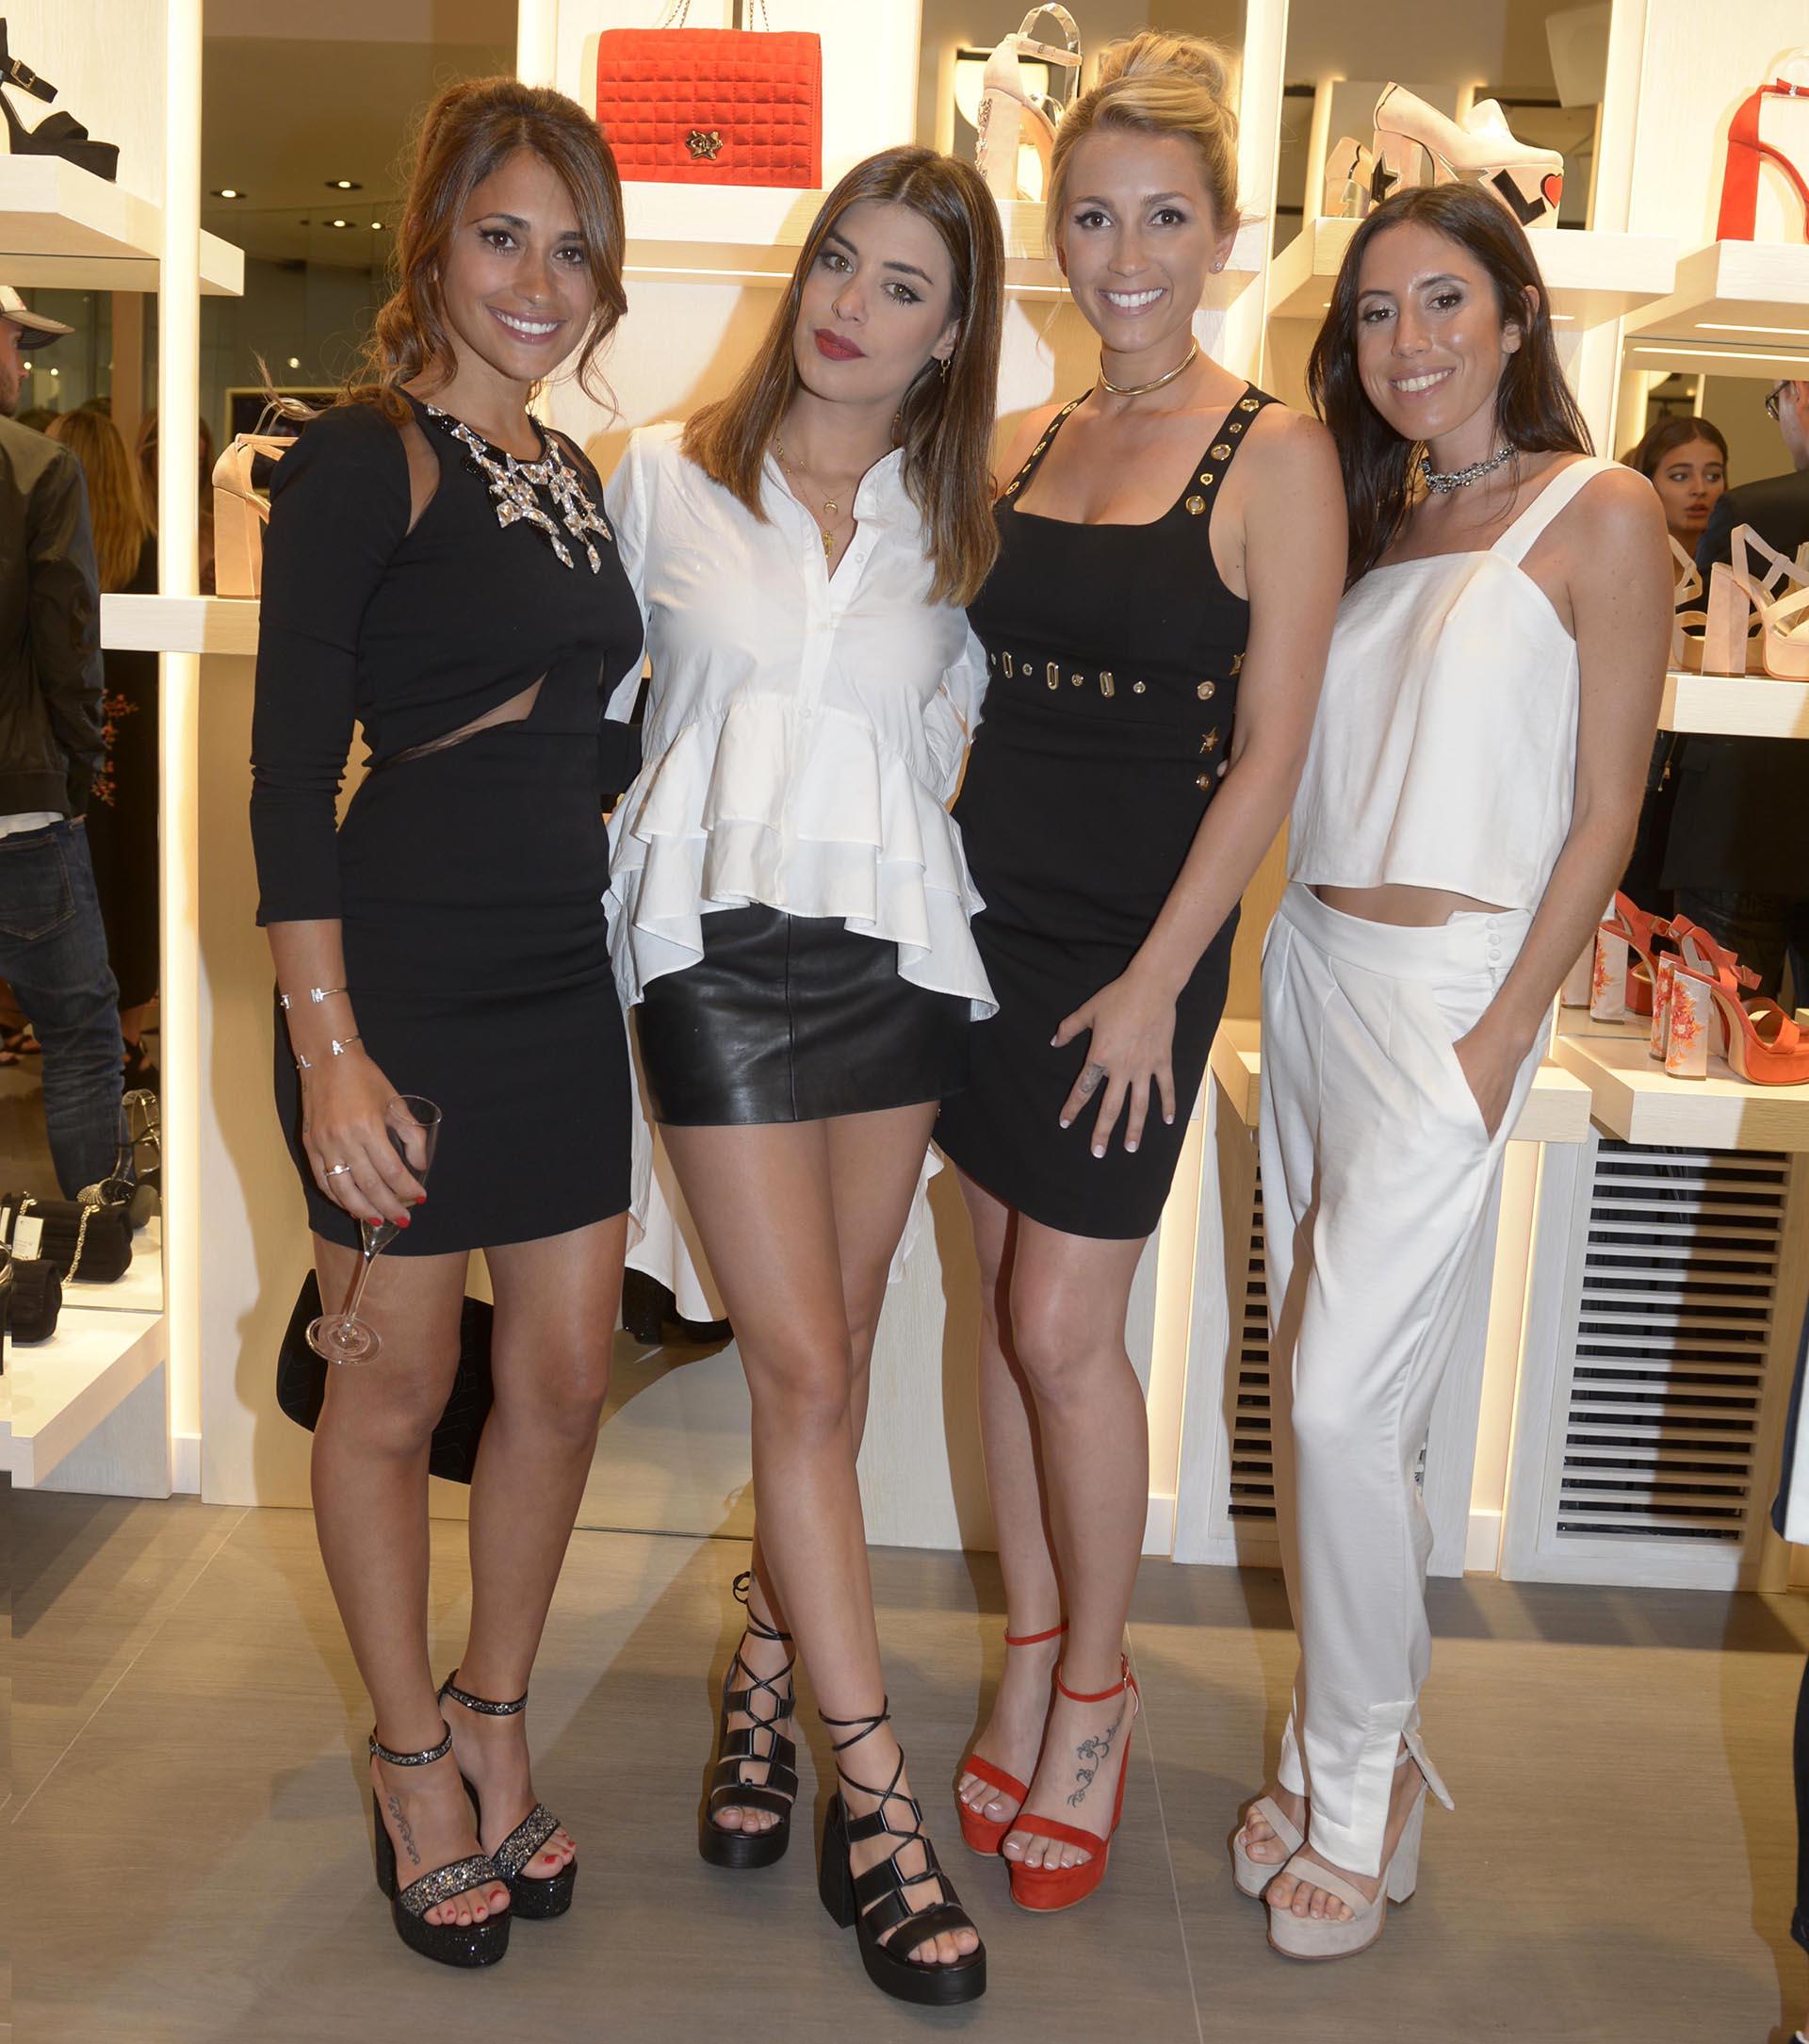 Antonella Rocuzzo, Dulceida, Sofia Balbi y Sofía Sarkany